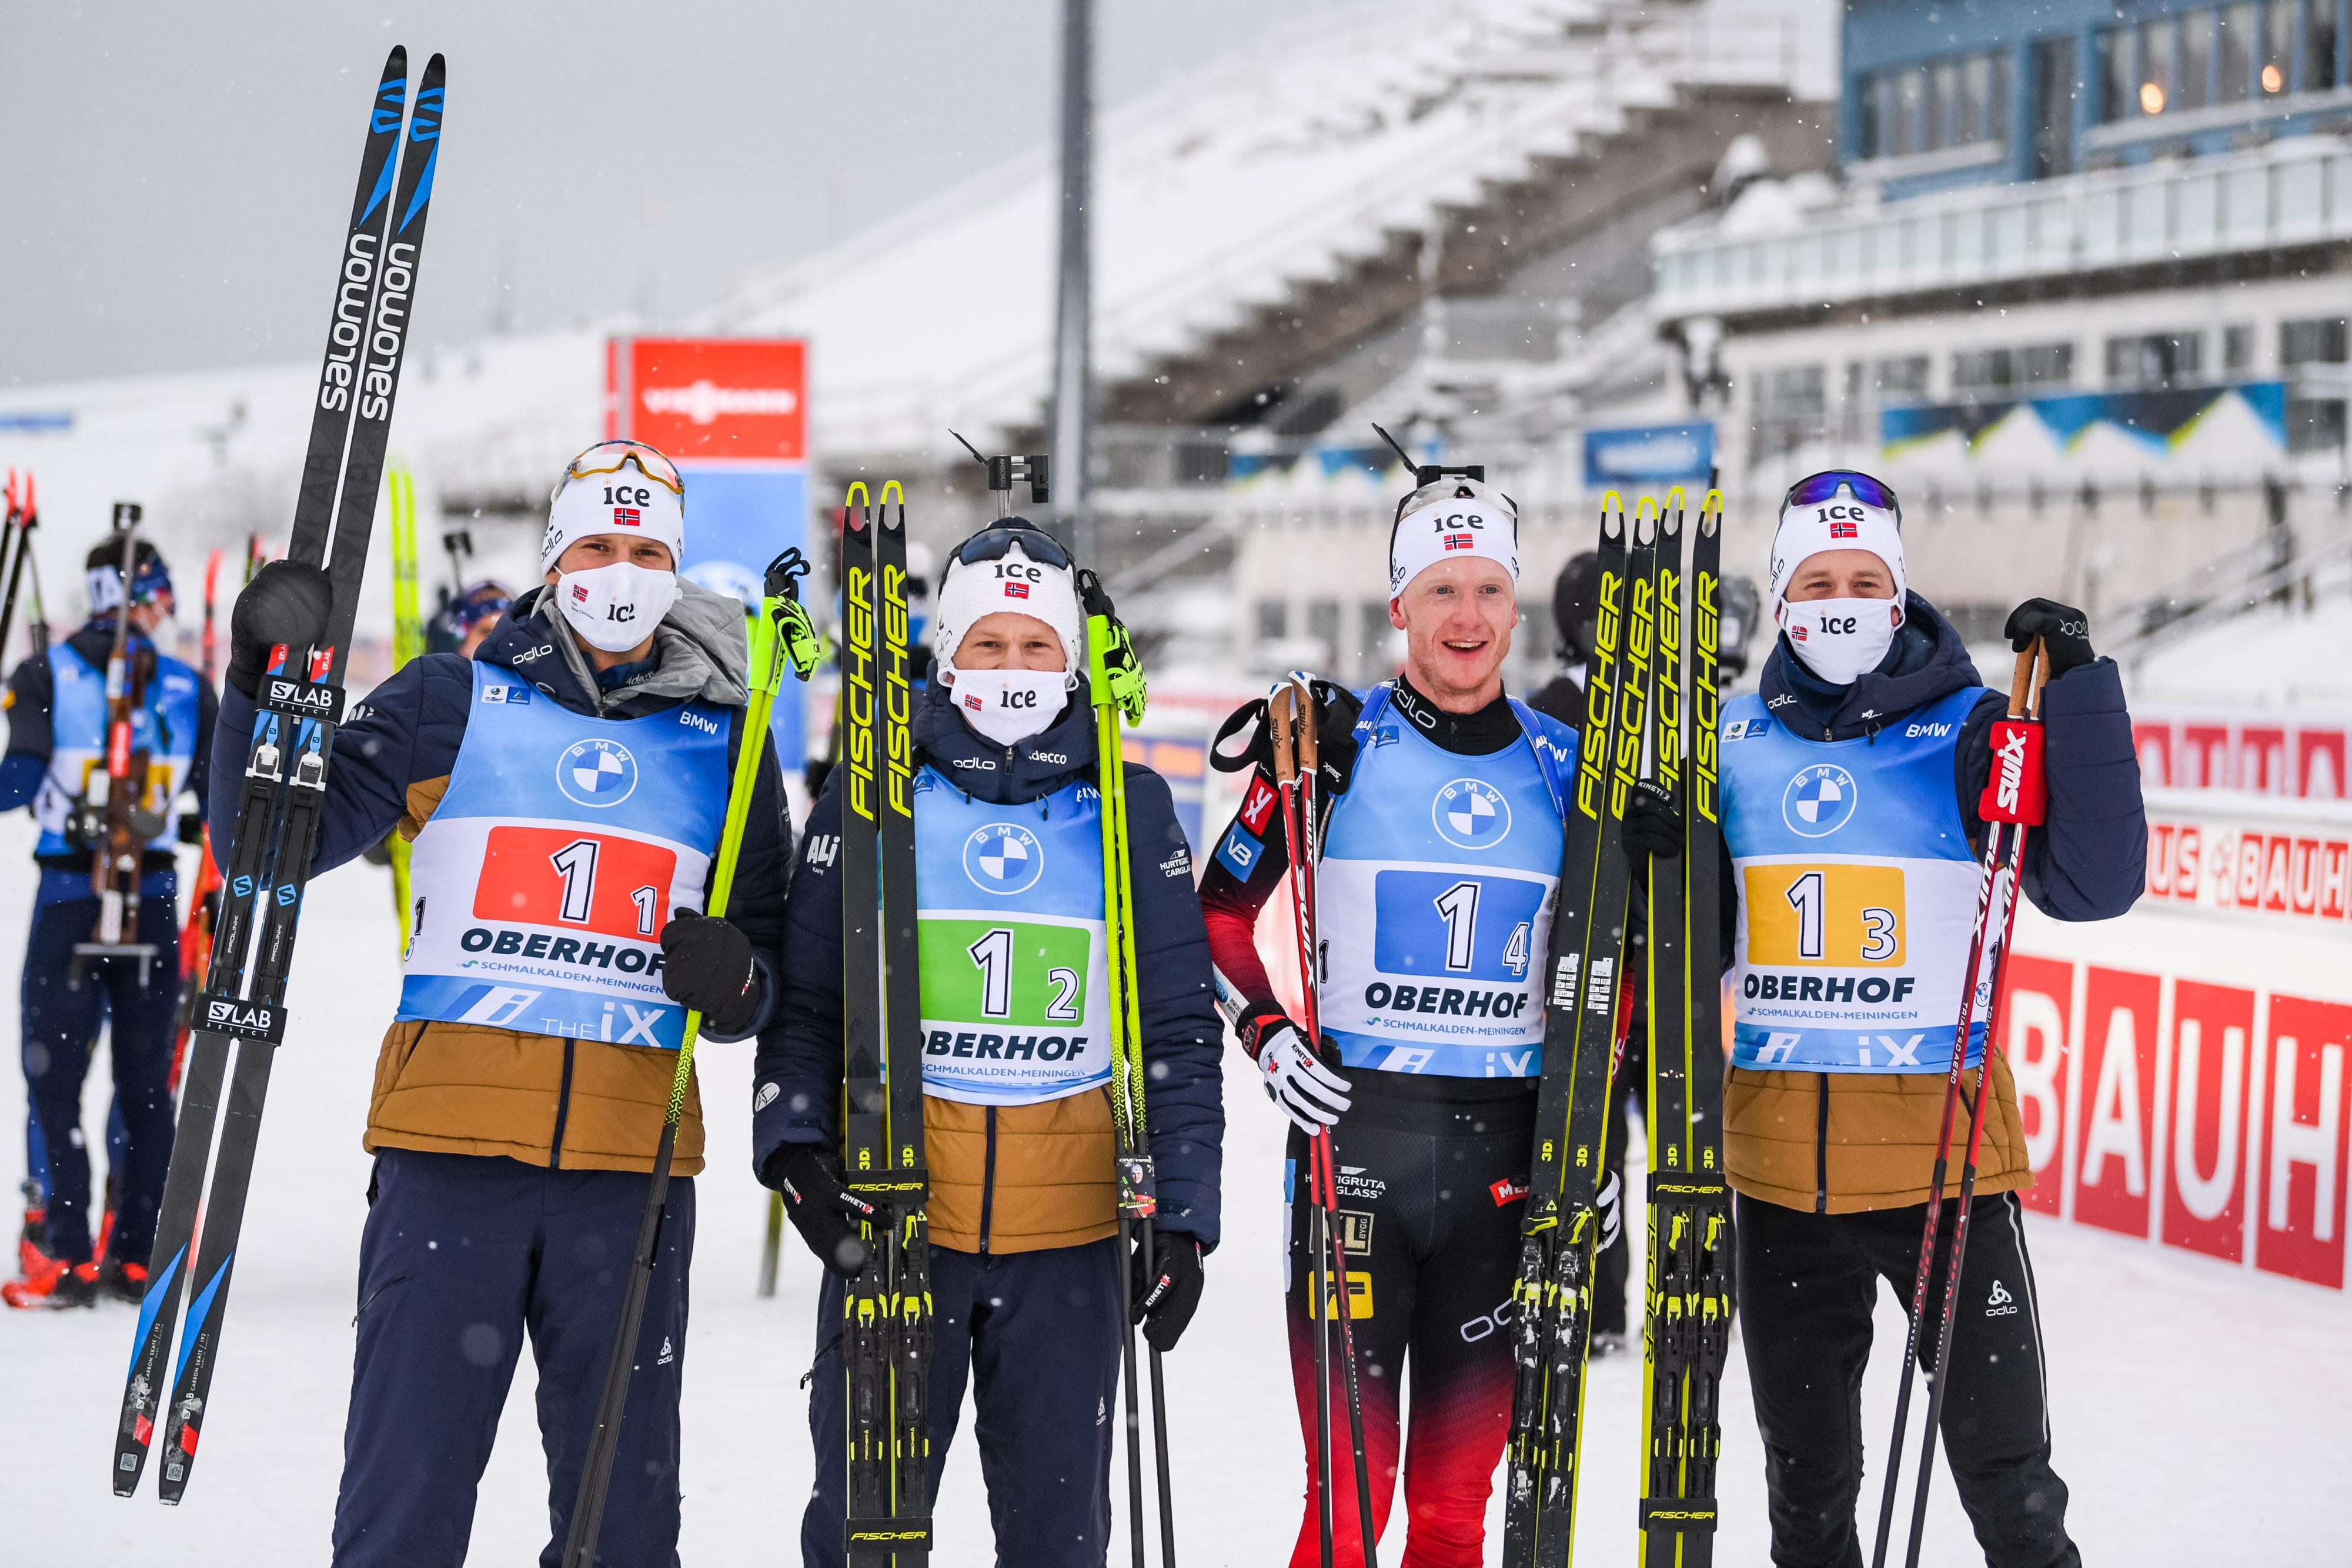 Staffel-Weltmeister Frankreich siegt in Oberhof